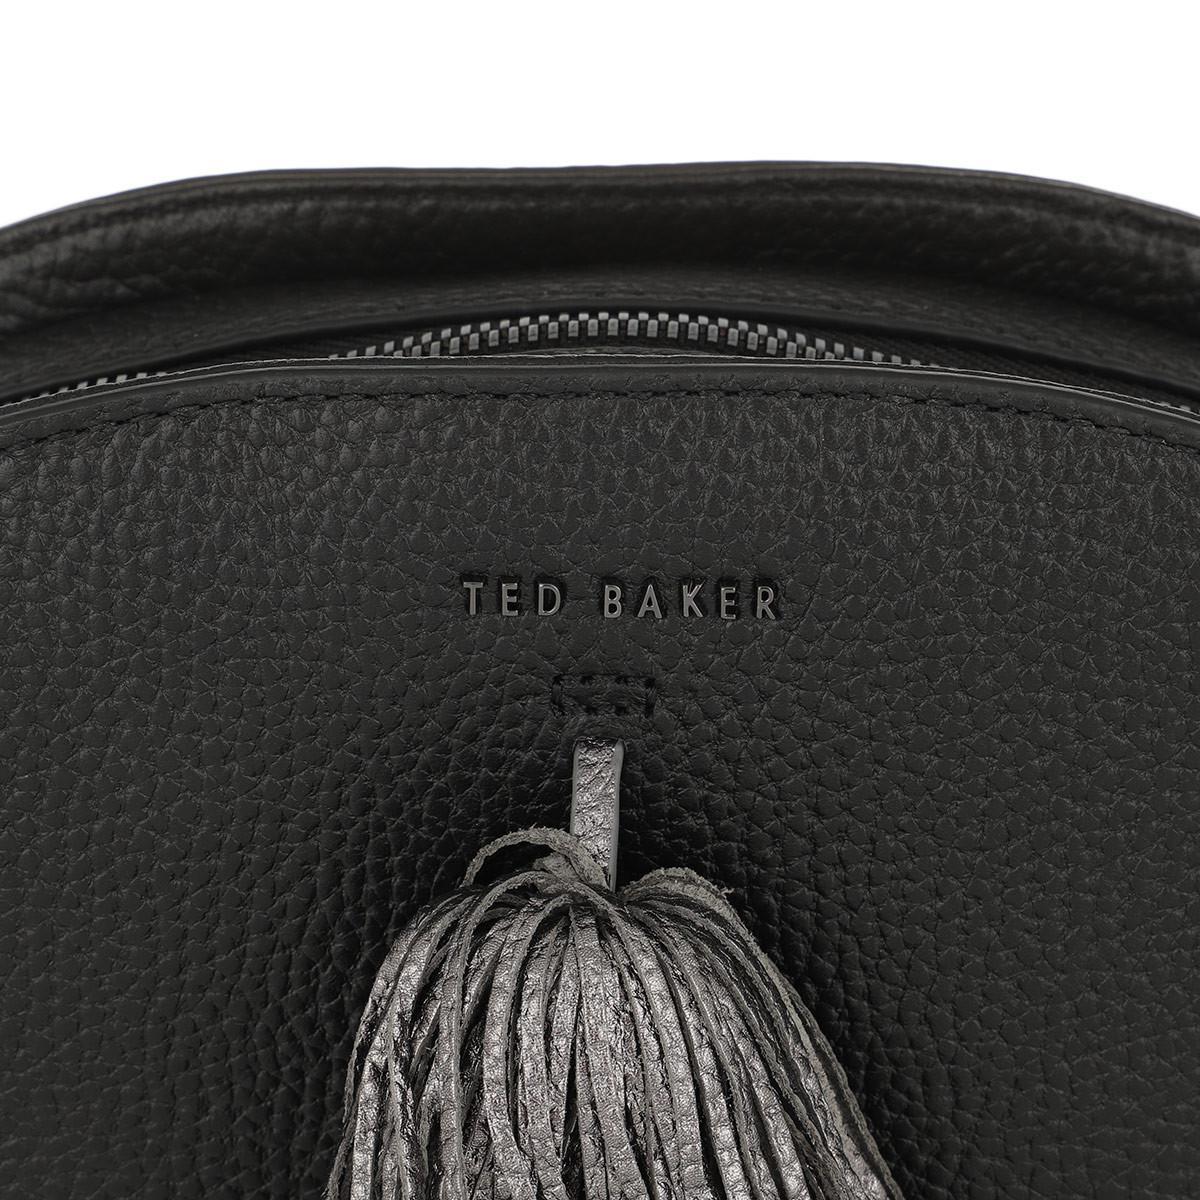 Ted Baker Leather Maaryy Crossbody Bag Black